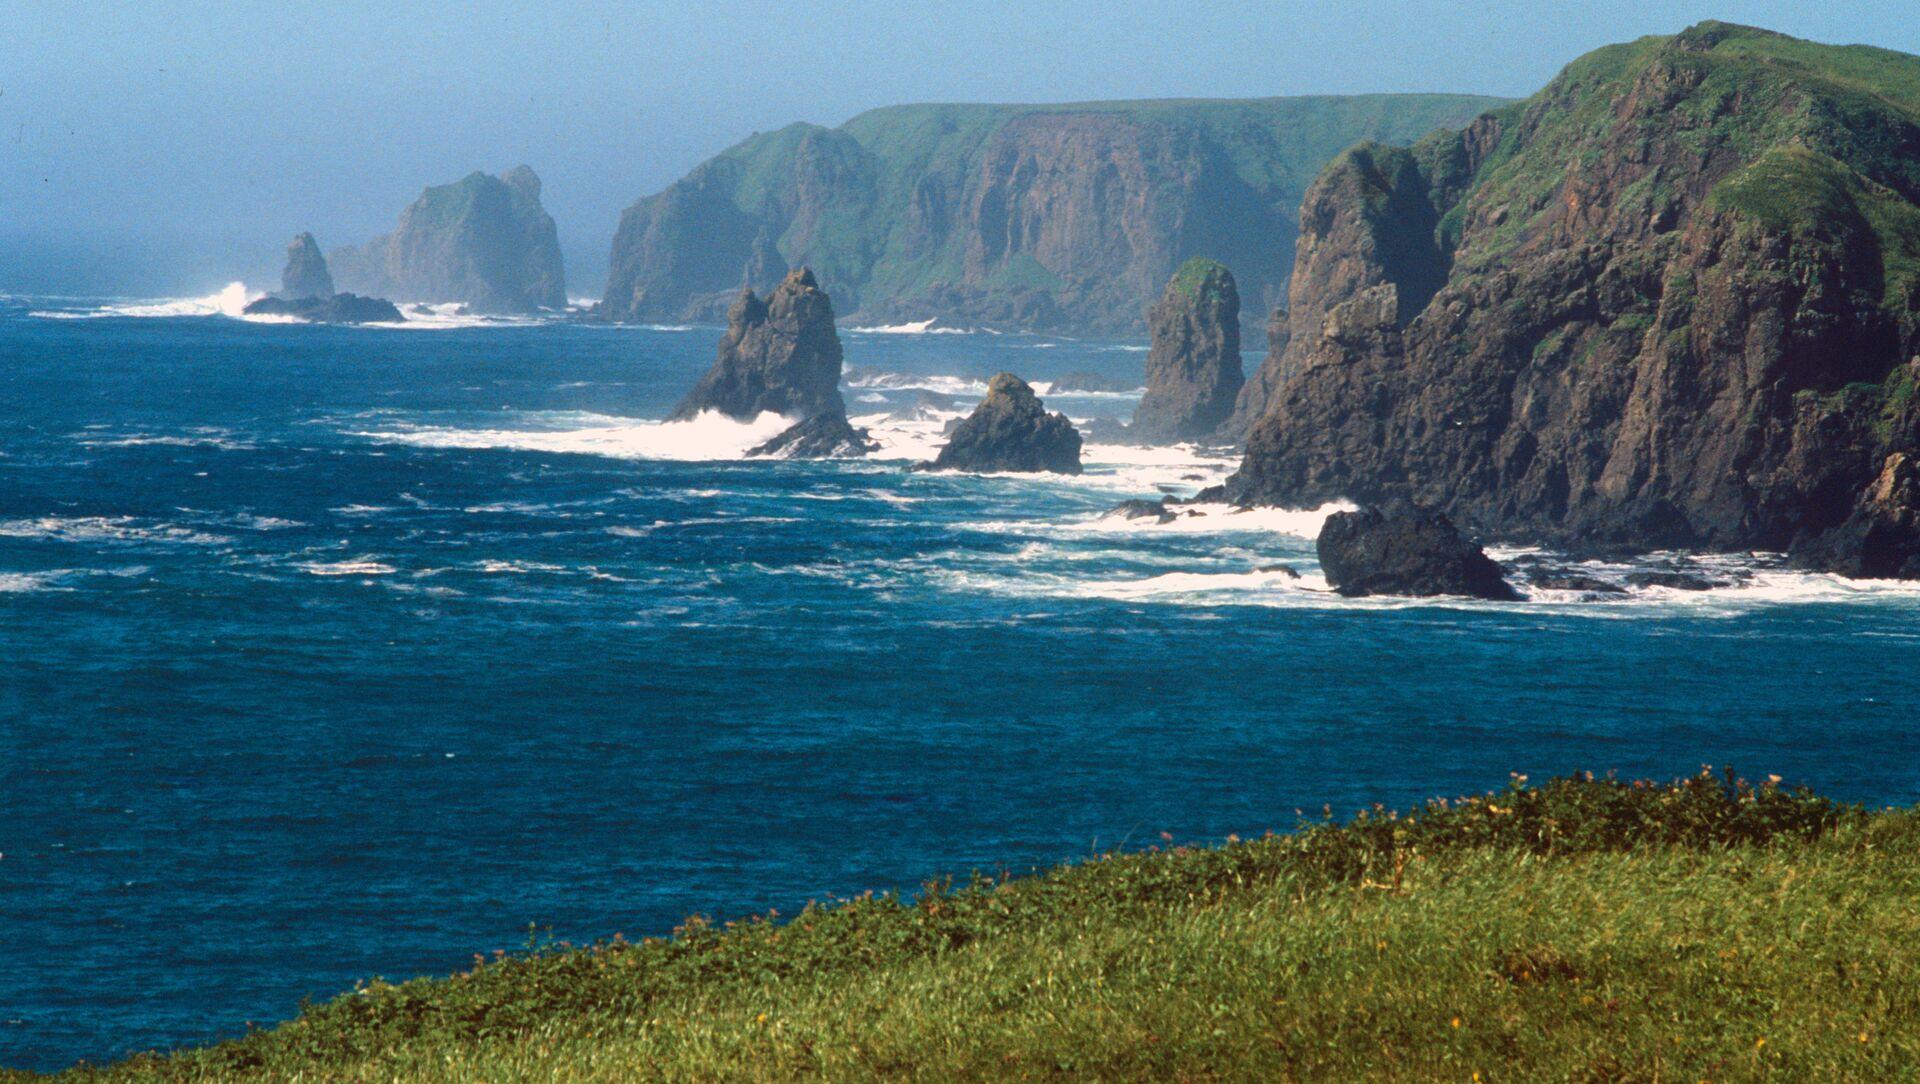 Rocks off Shikotan Island, aka Spanberg or Sikotan, in the Kurils - Sputnik International, 1920, 26.07.2021